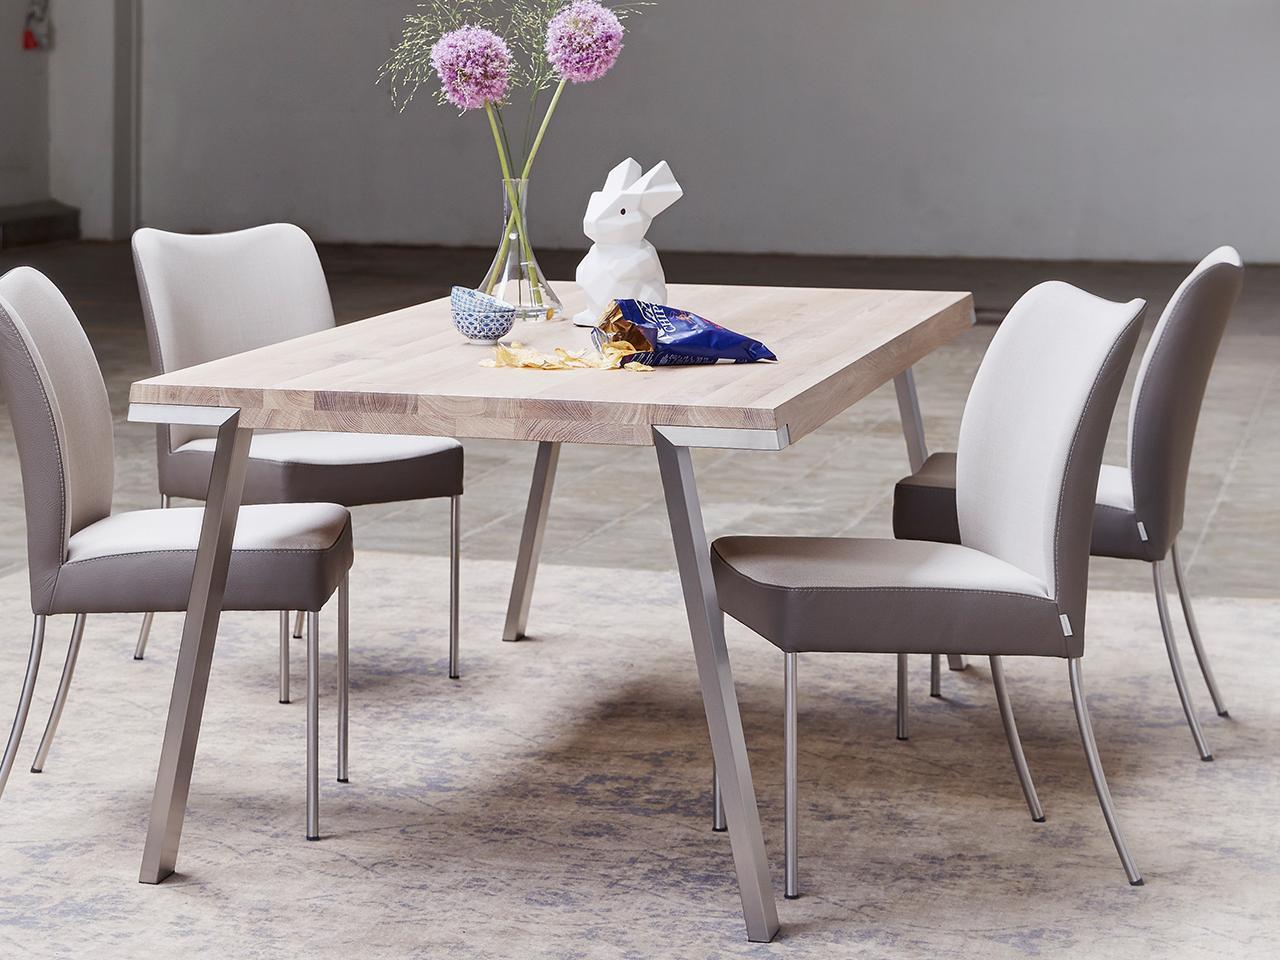 bert plantagie seven eettafel wiechers wonen. Black Bedroom Furniture Sets. Home Design Ideas